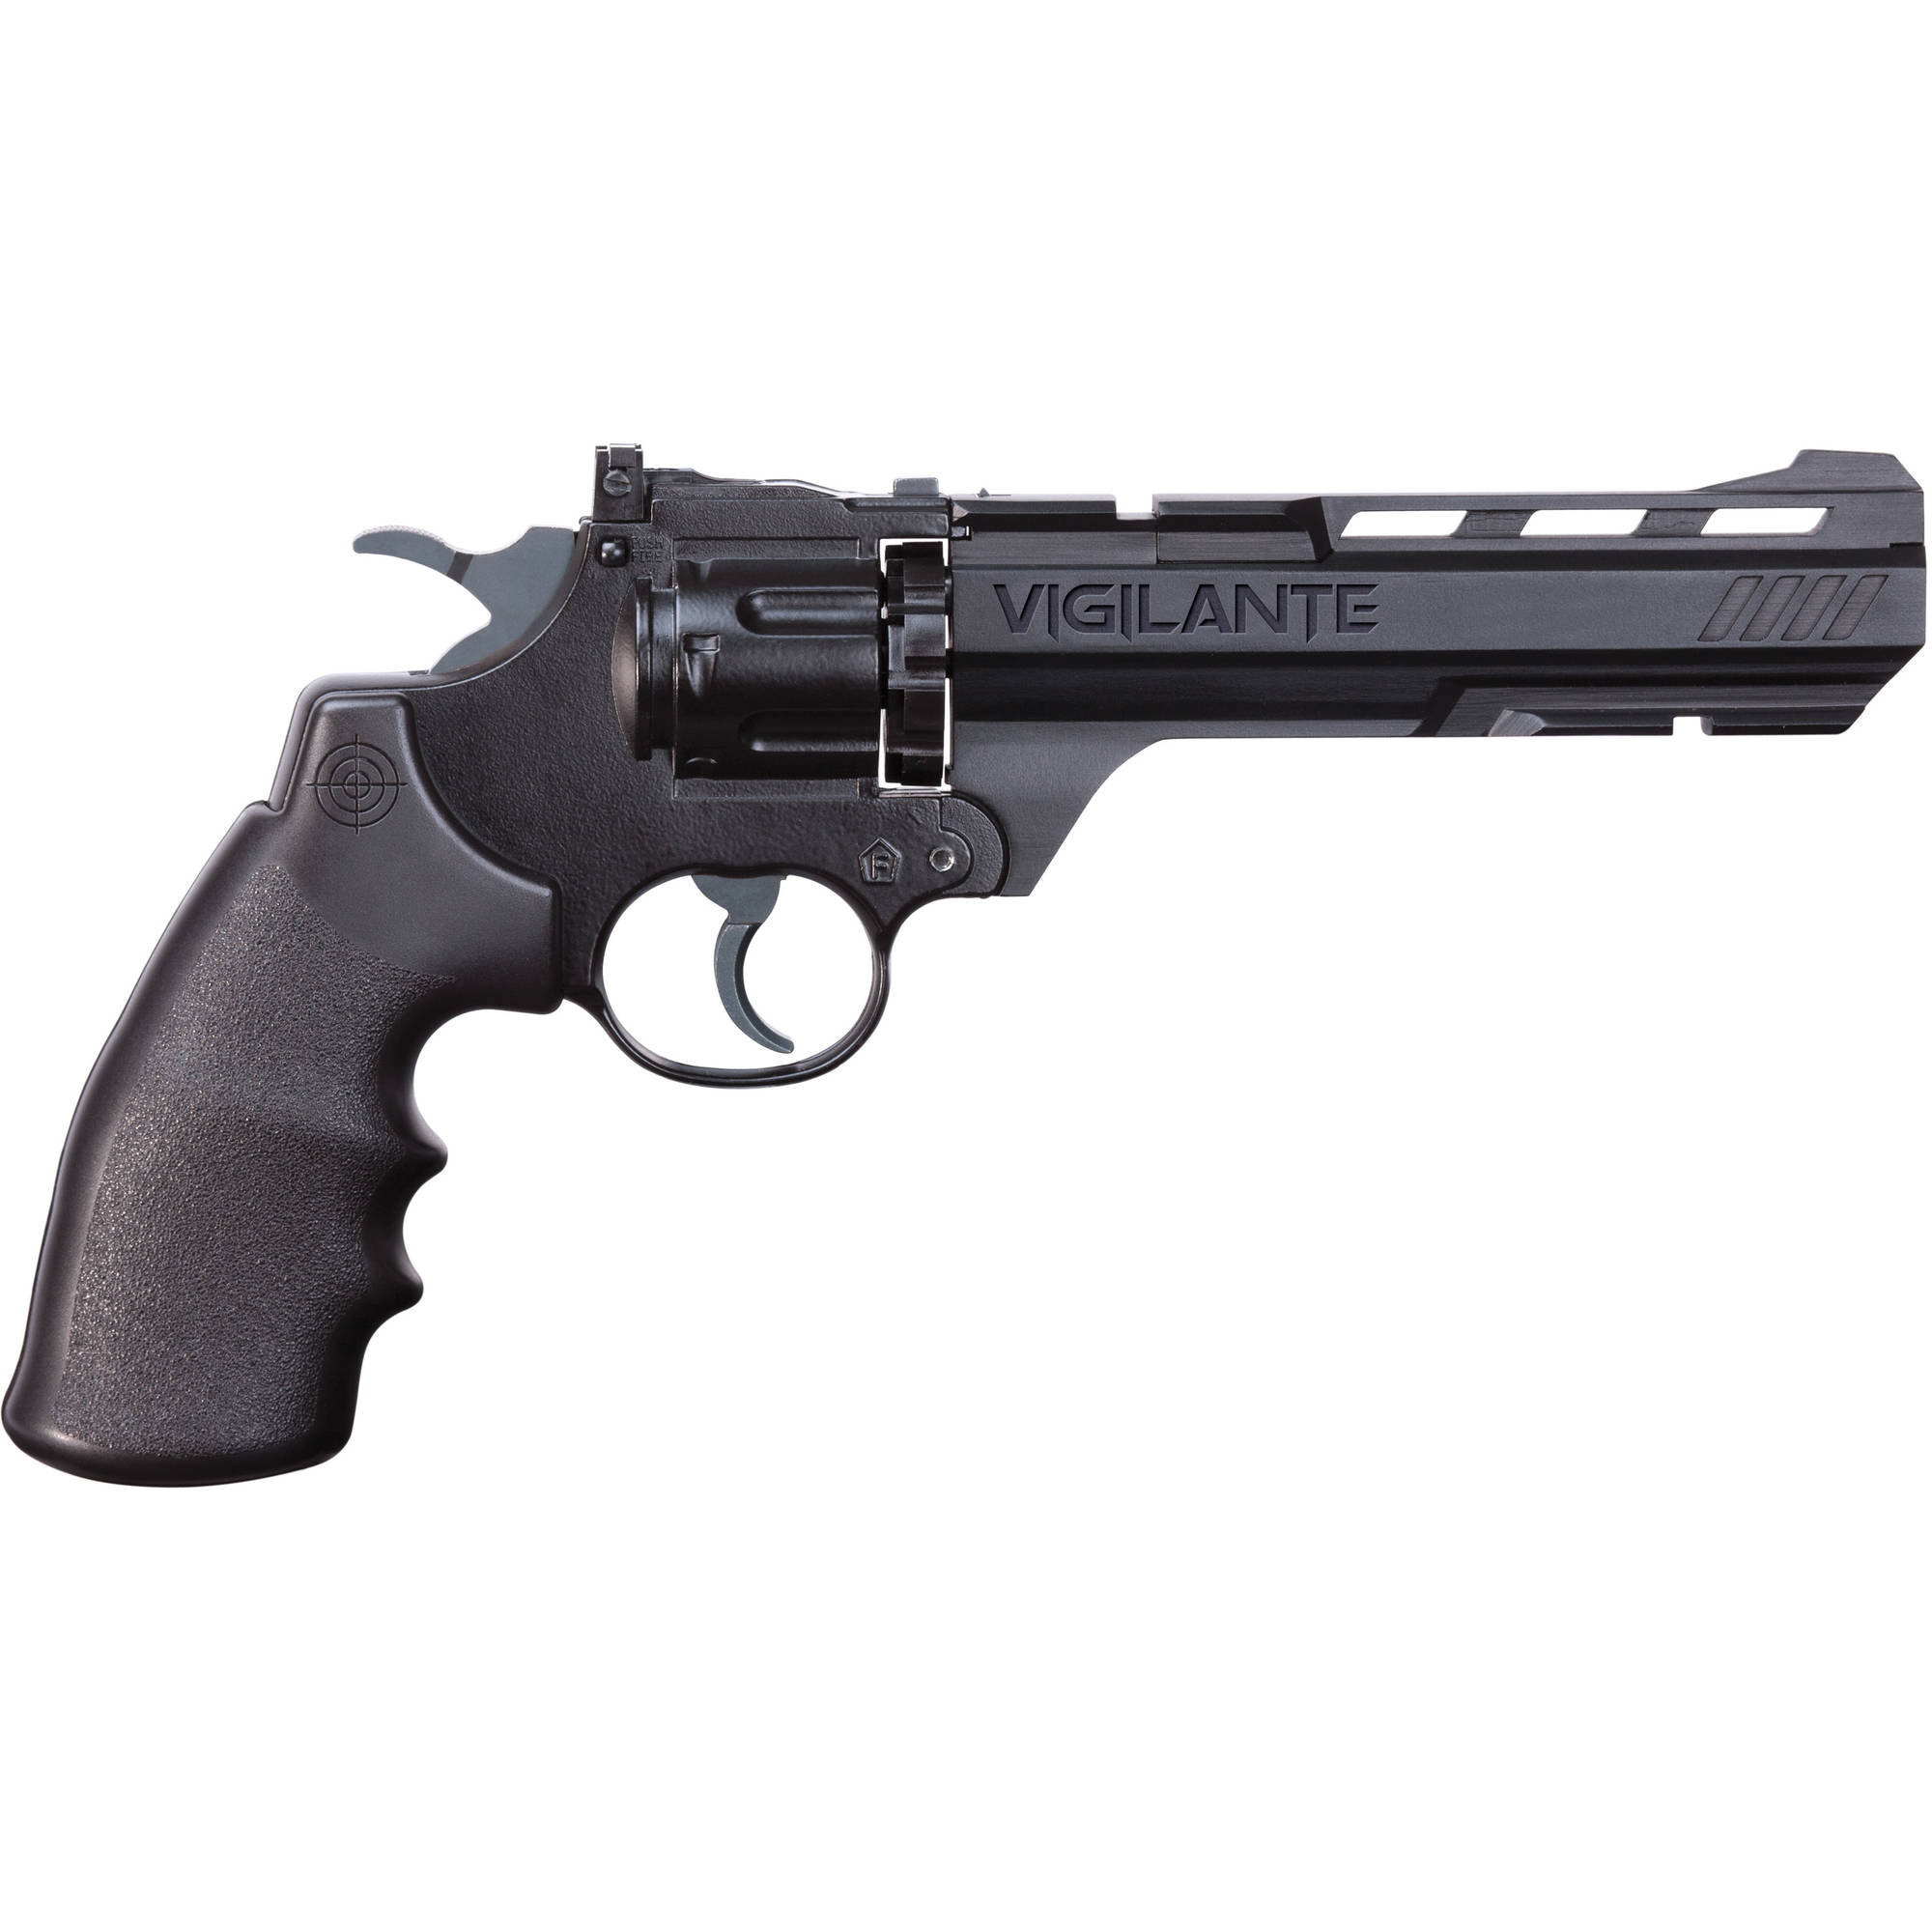 Crosman Vigilante BB Pellet Revolver .177 Caliber CO2 Air Pistol, 465fps by Crosman Corporation